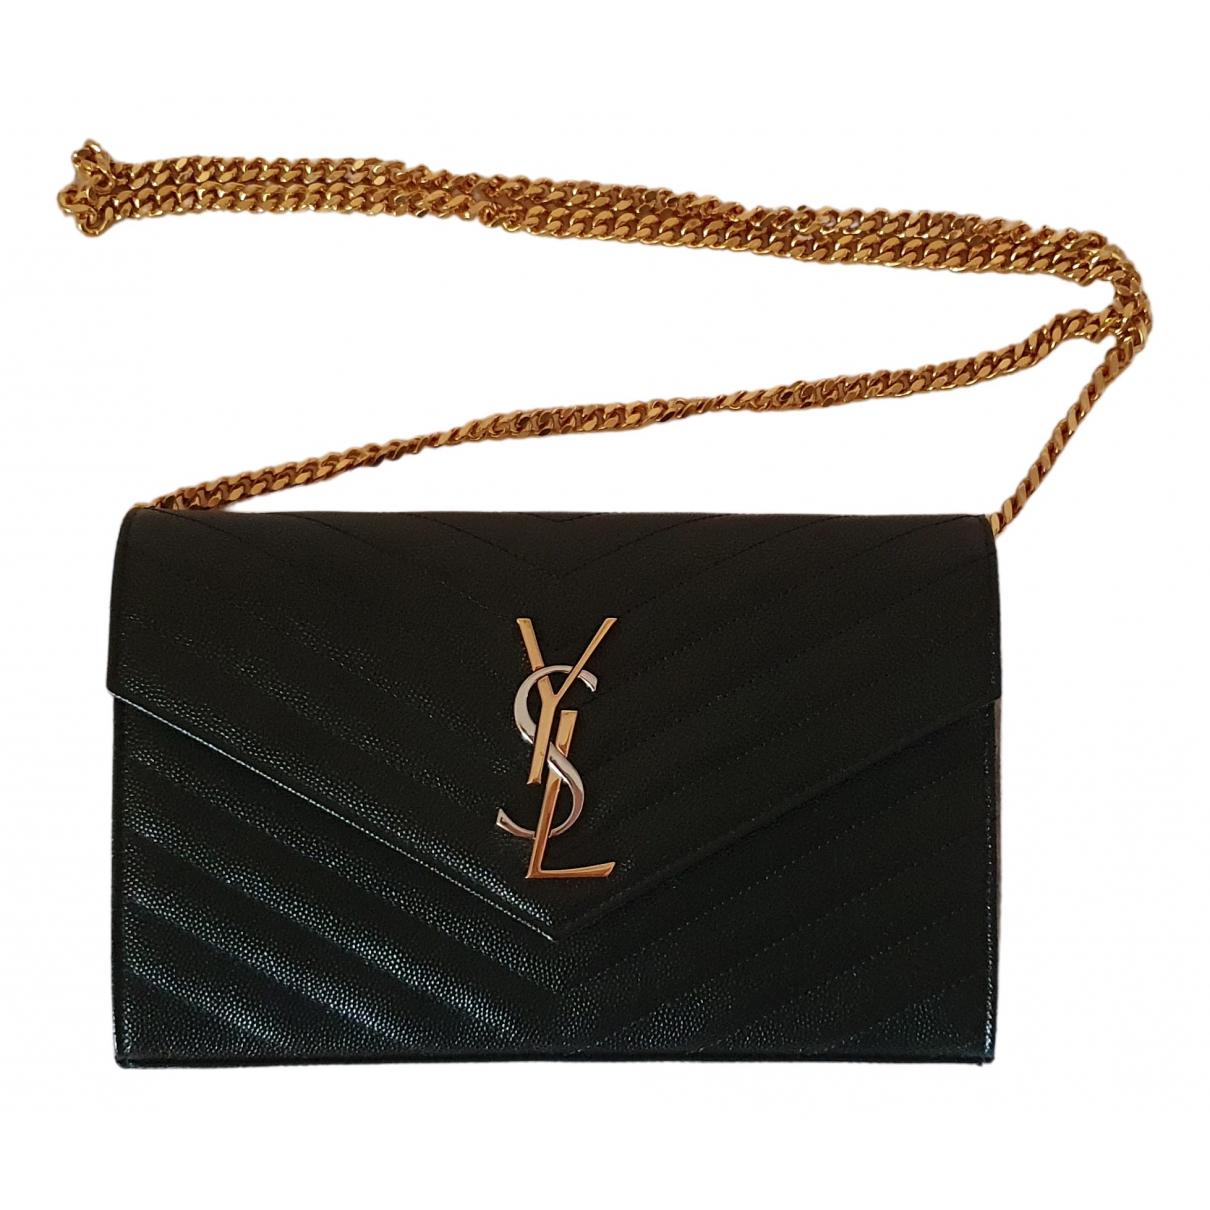 Saint Laurent Portefeuille enveloppe Black Leather Clutch bag for Women N